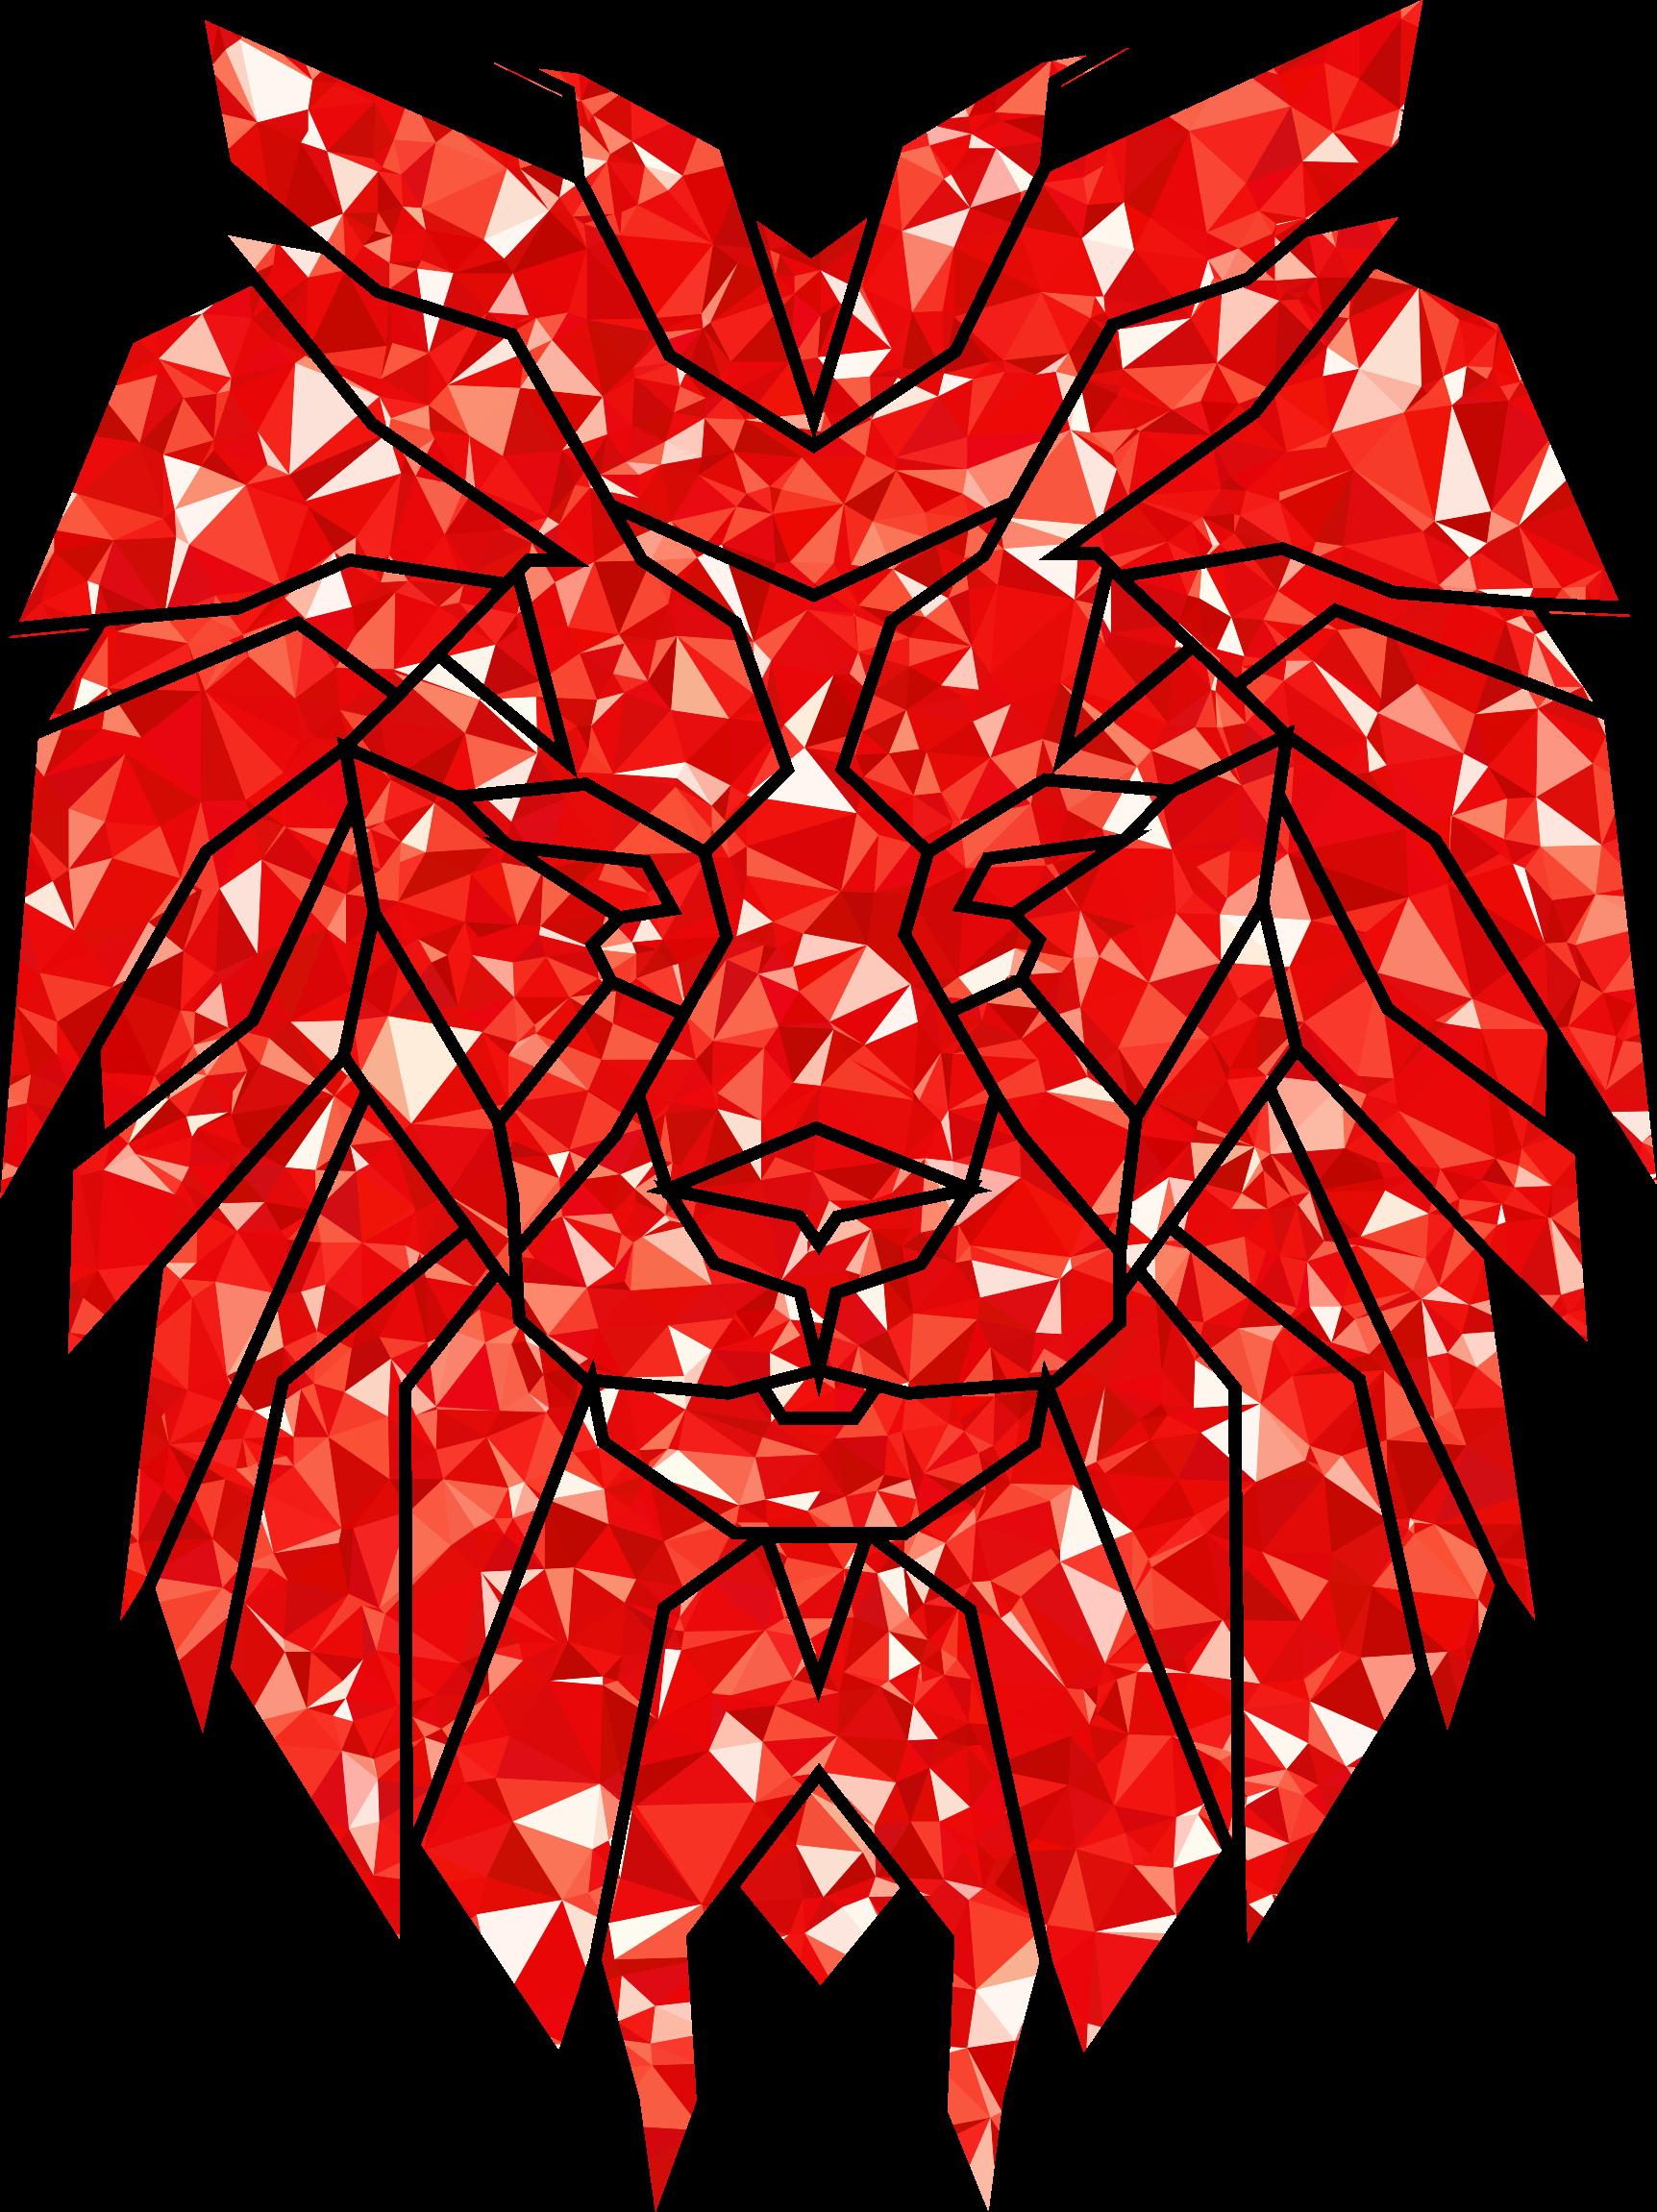 Diamonds clipart ruby. Polygonal lion face big